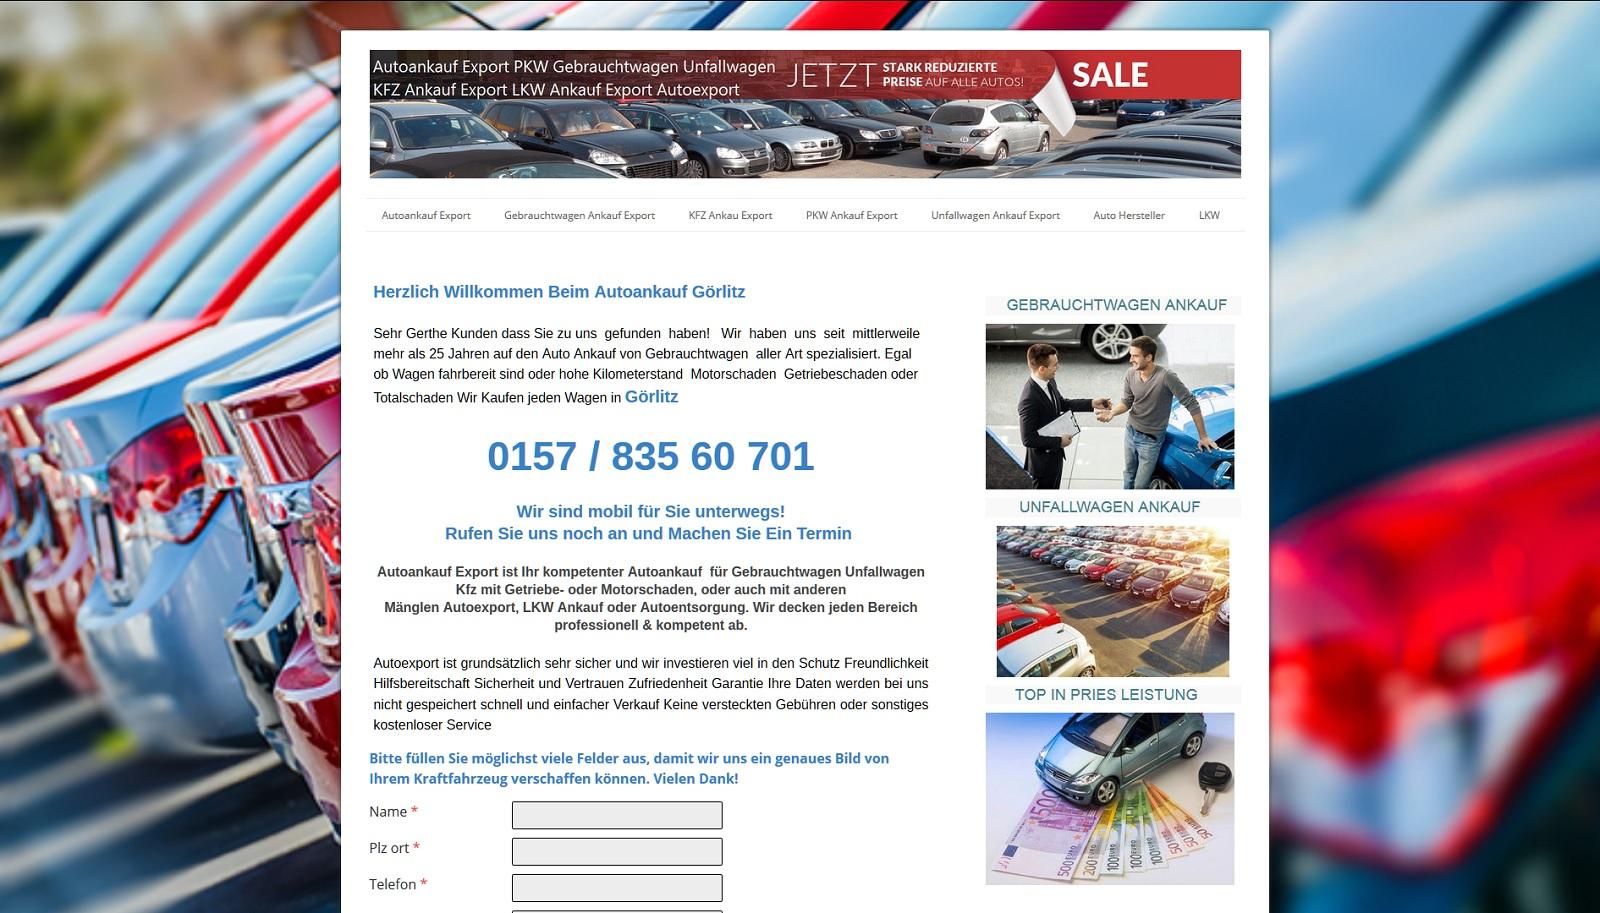 auto-ankauf-export.de - Autoankauf Schweinfurt